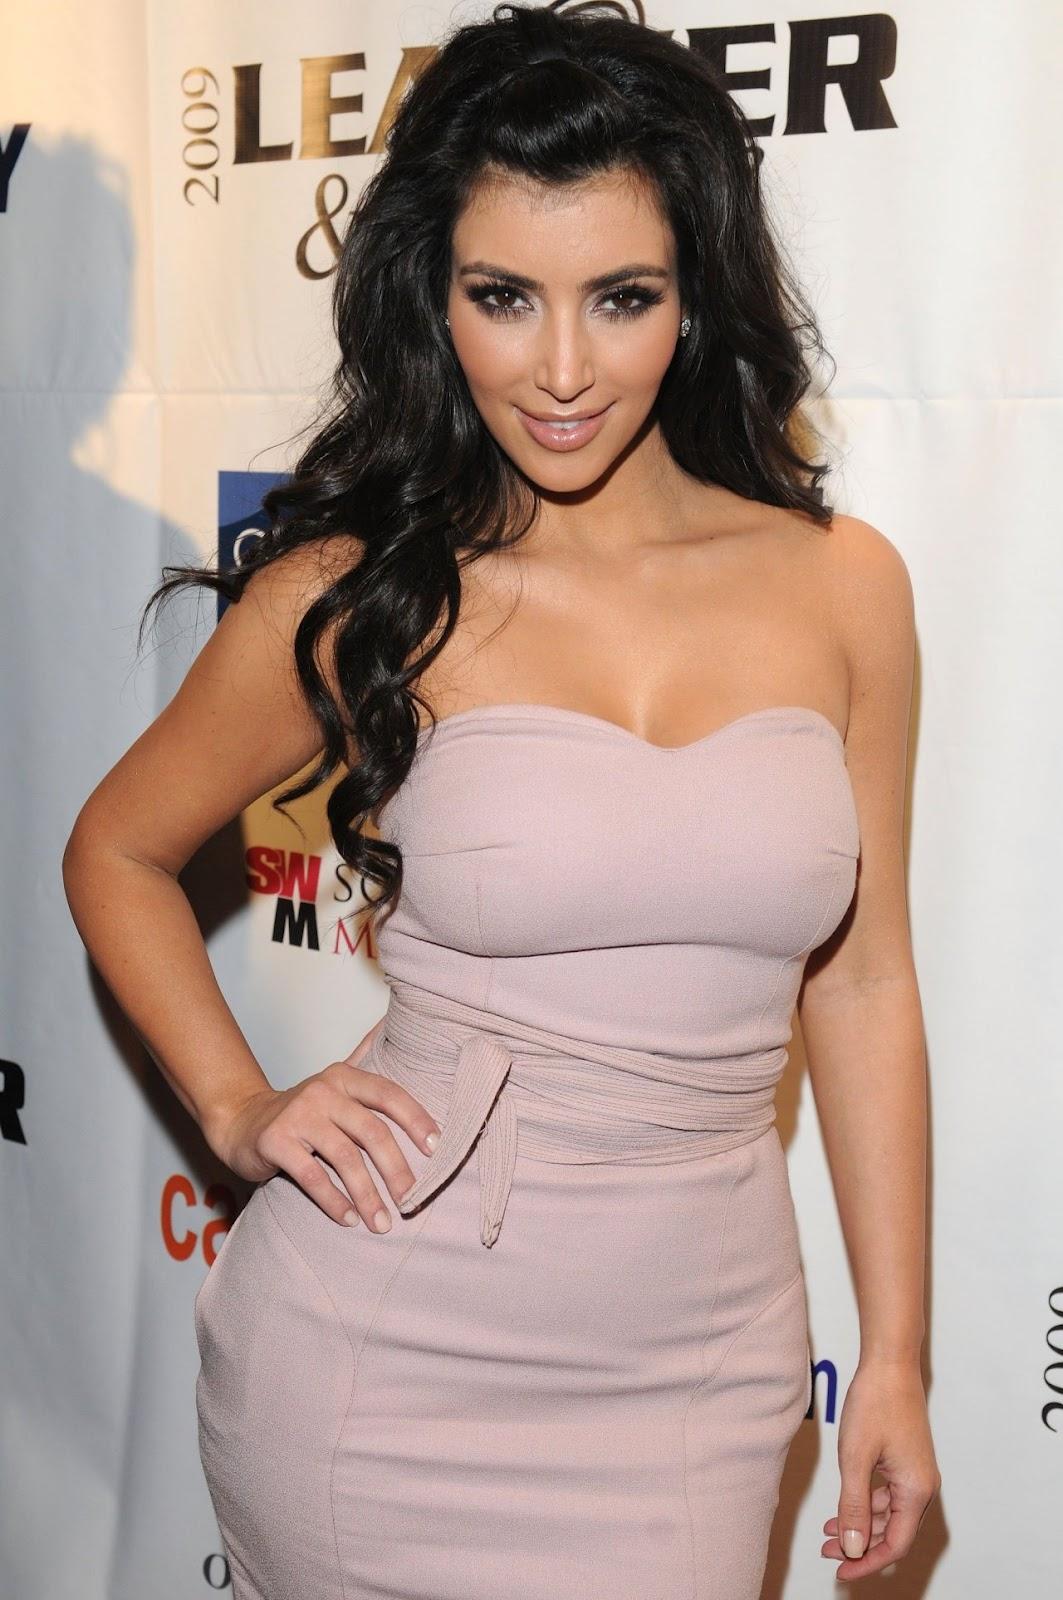 imagenes de kim kardashian sin ropa - Kanye West publica fotos íntimas de Kim Kardashian